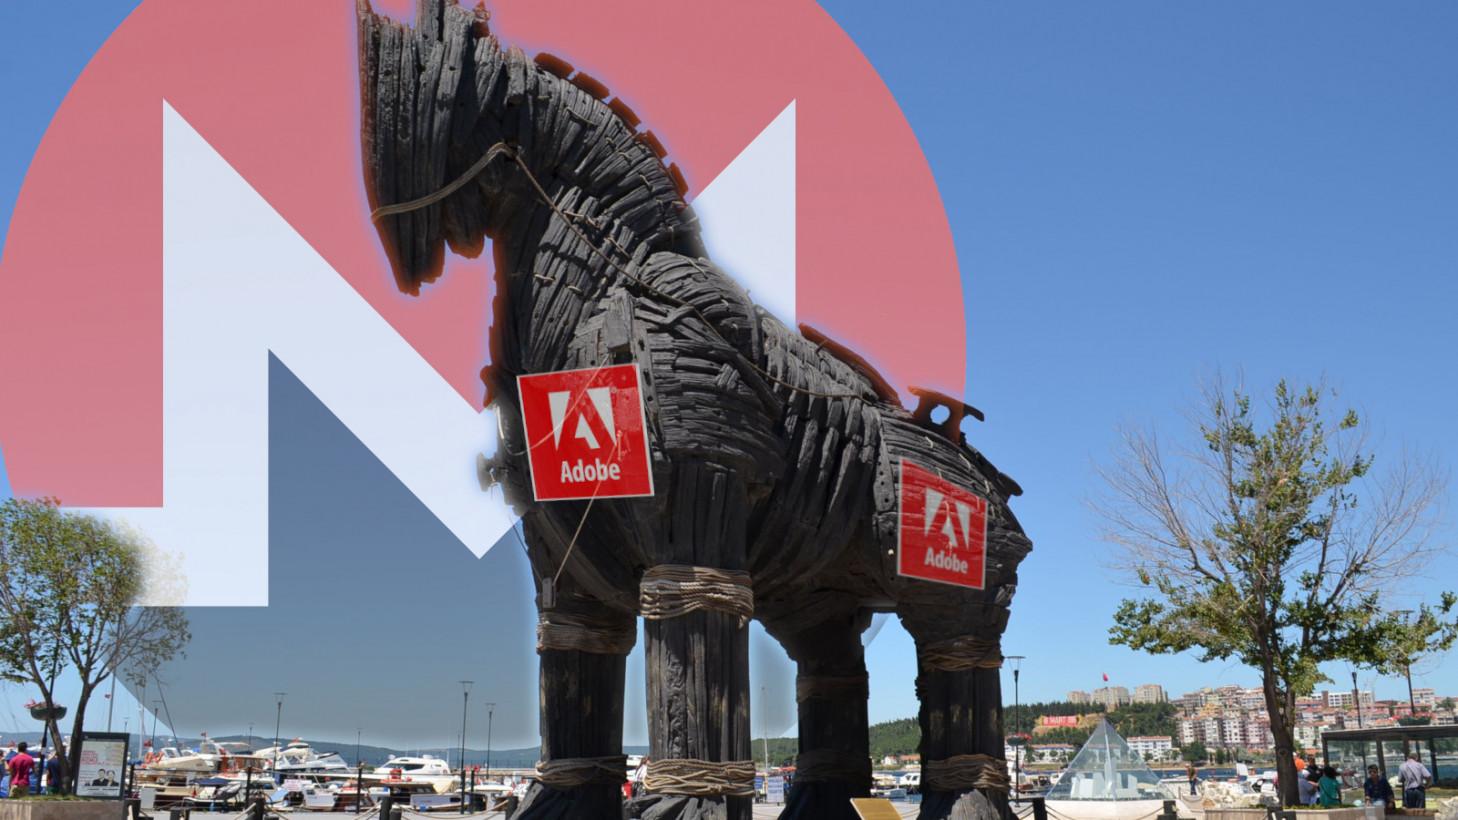 thenextweb.com - Matthew Beedham - Hackers hide cryptocurrency mining malware in Adobe Flash updates